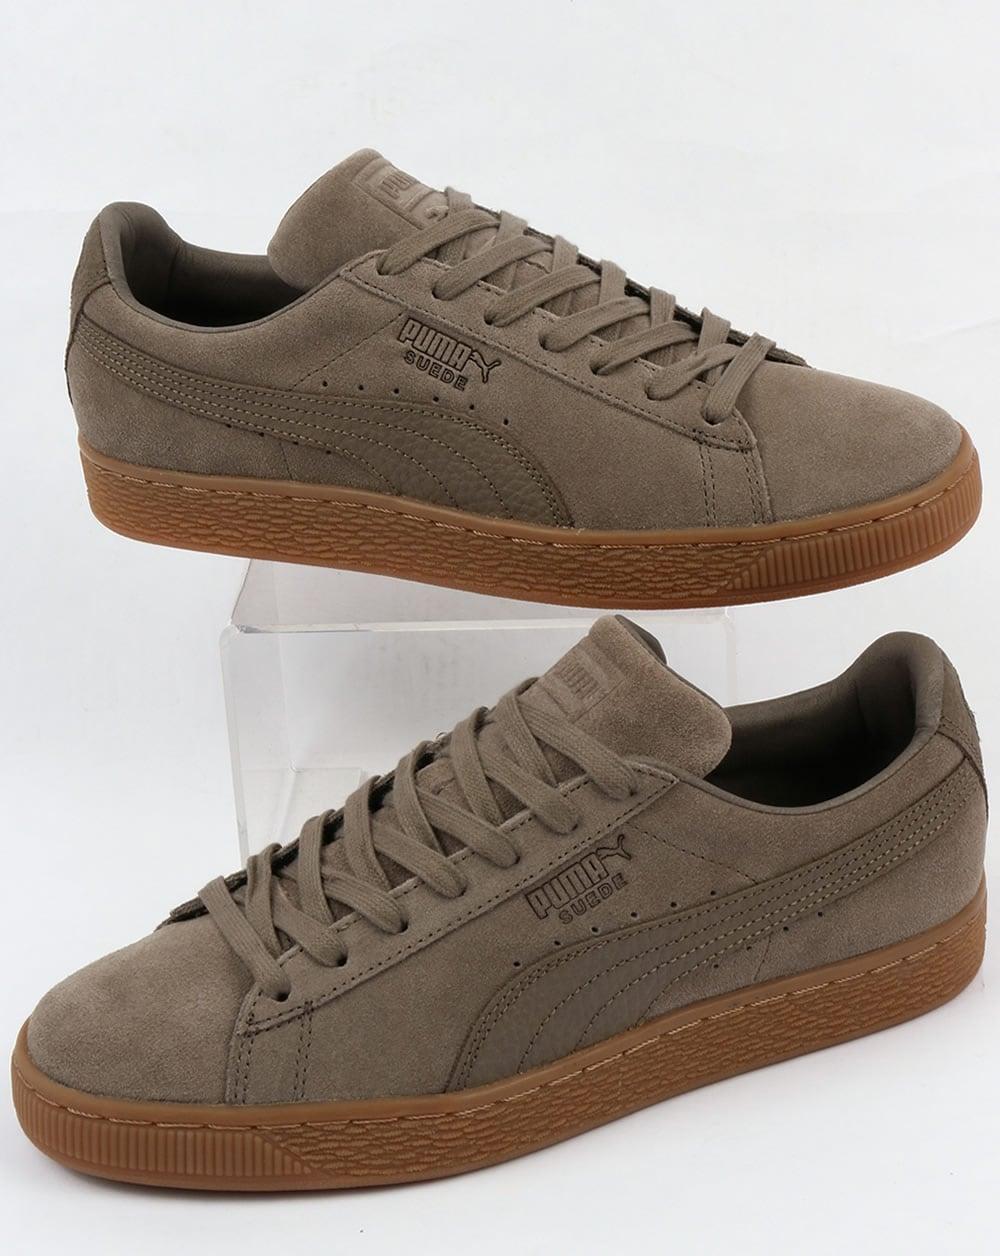 Puma Suede Classic Trainers,grey